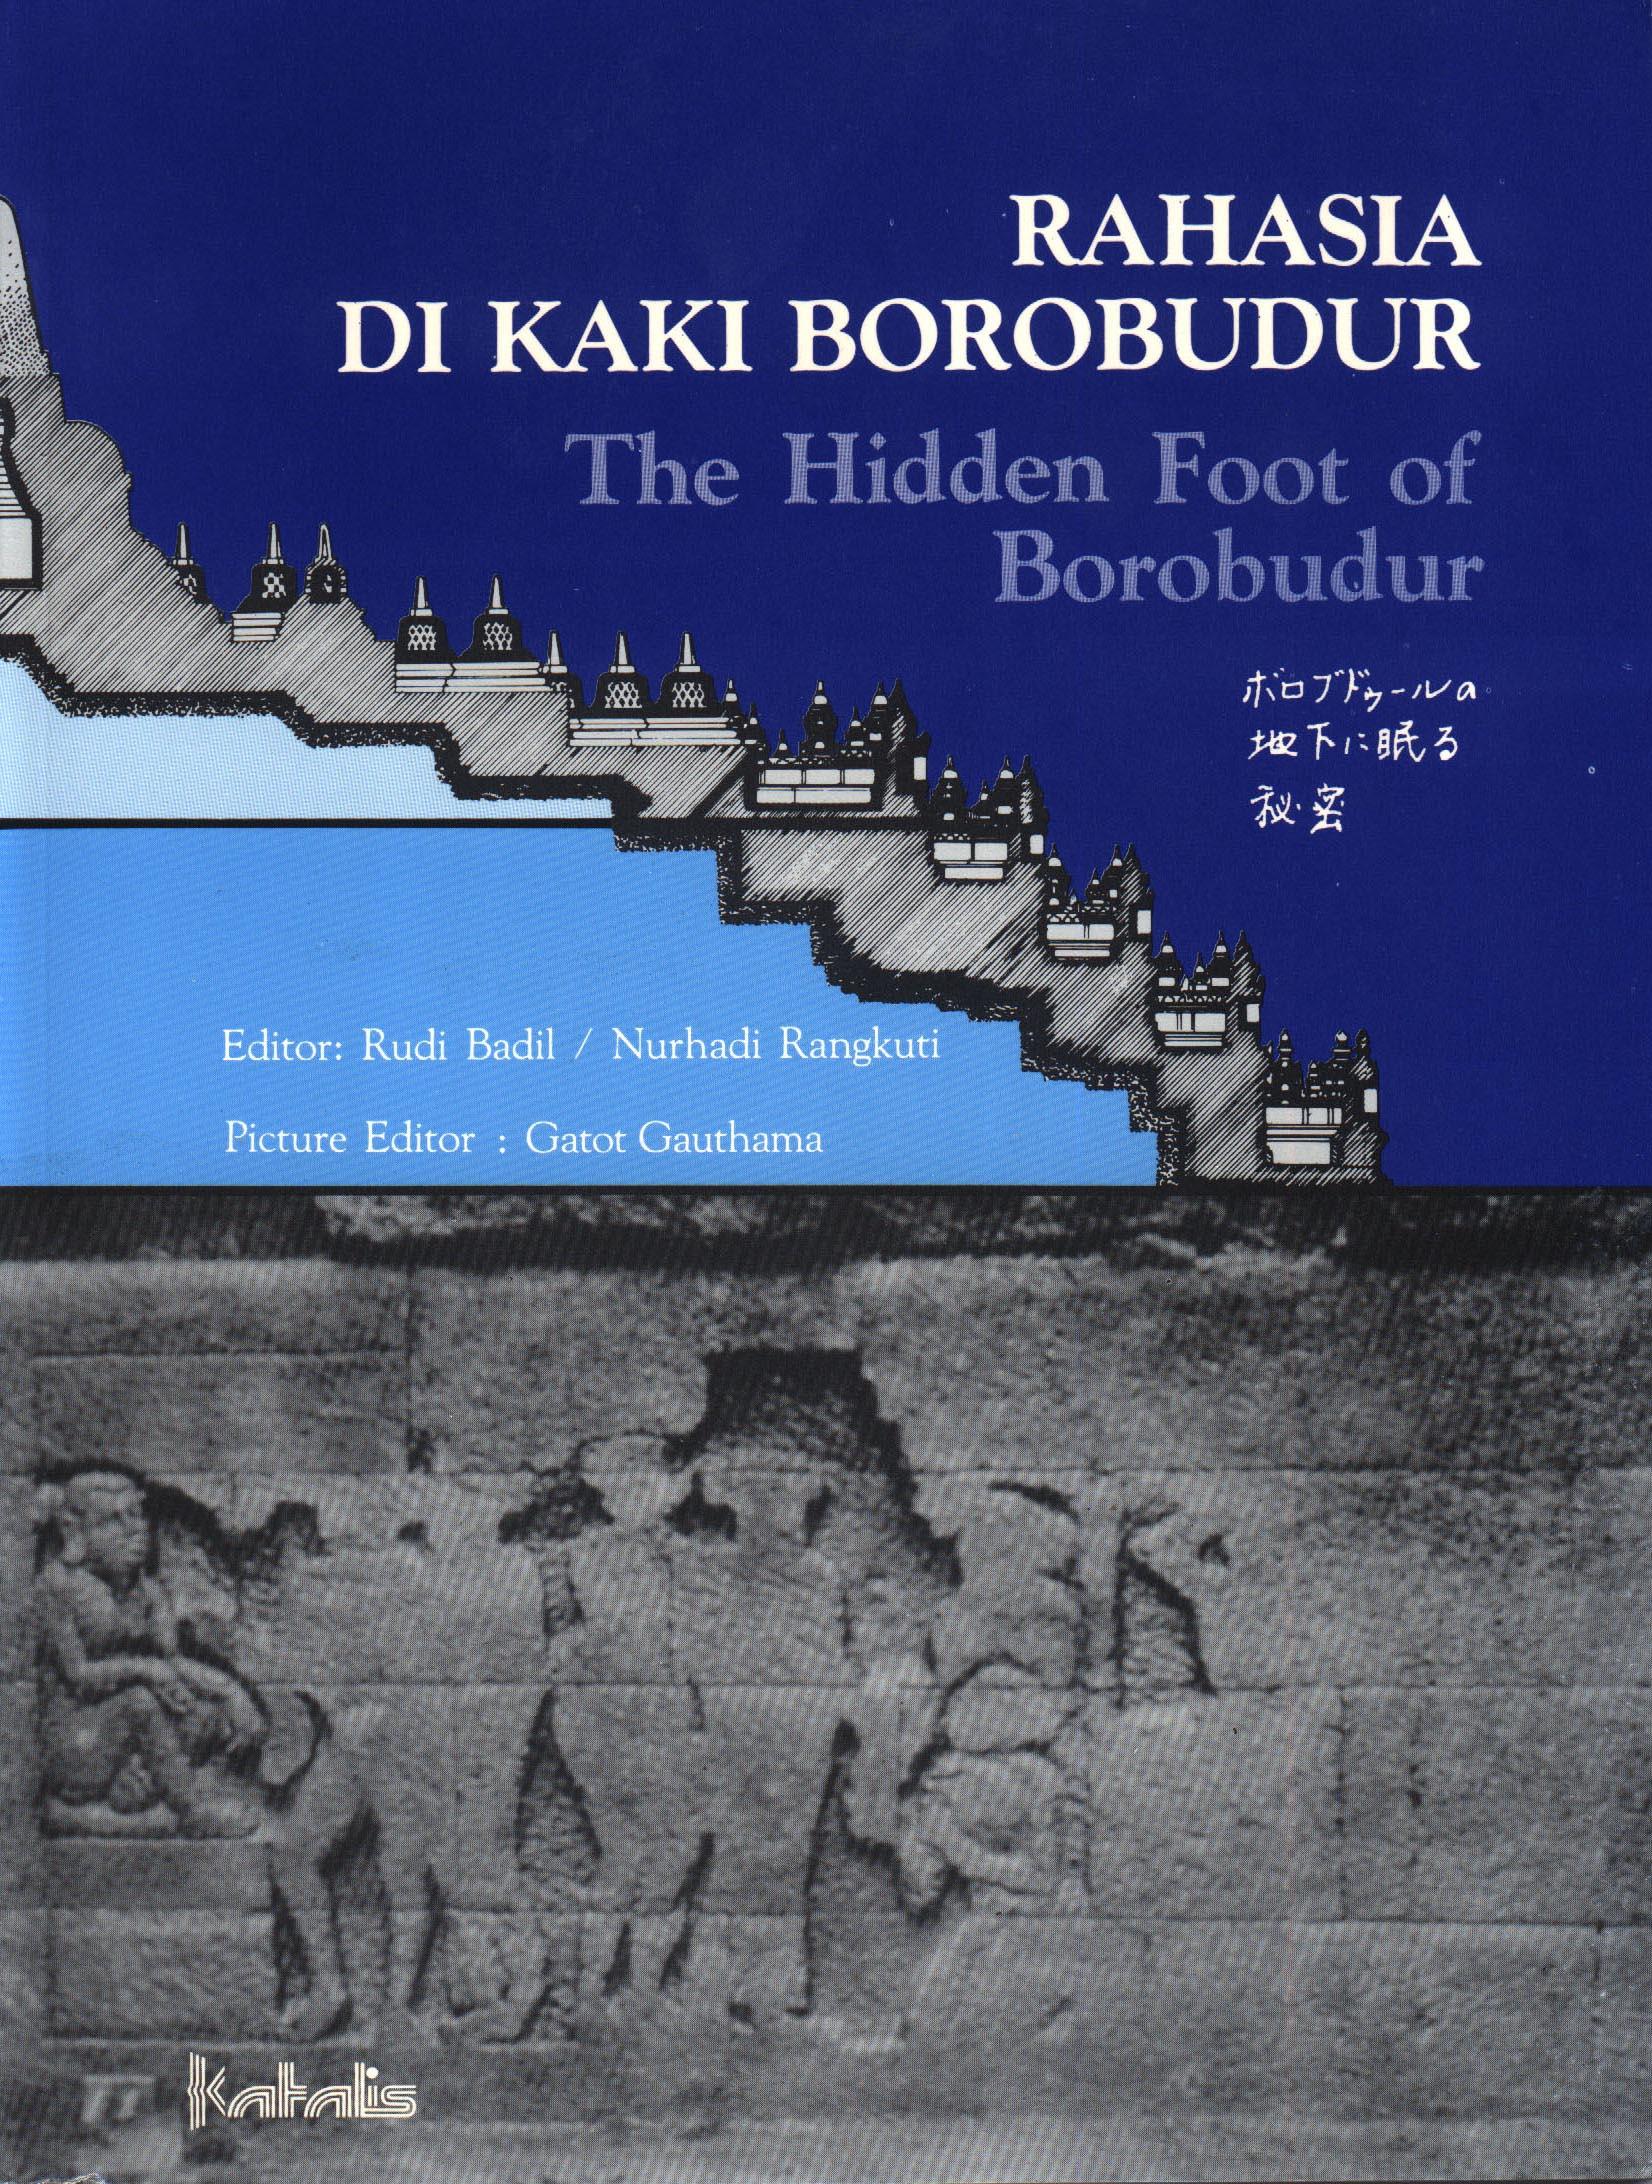 Rahasia di Kaki Borobudur